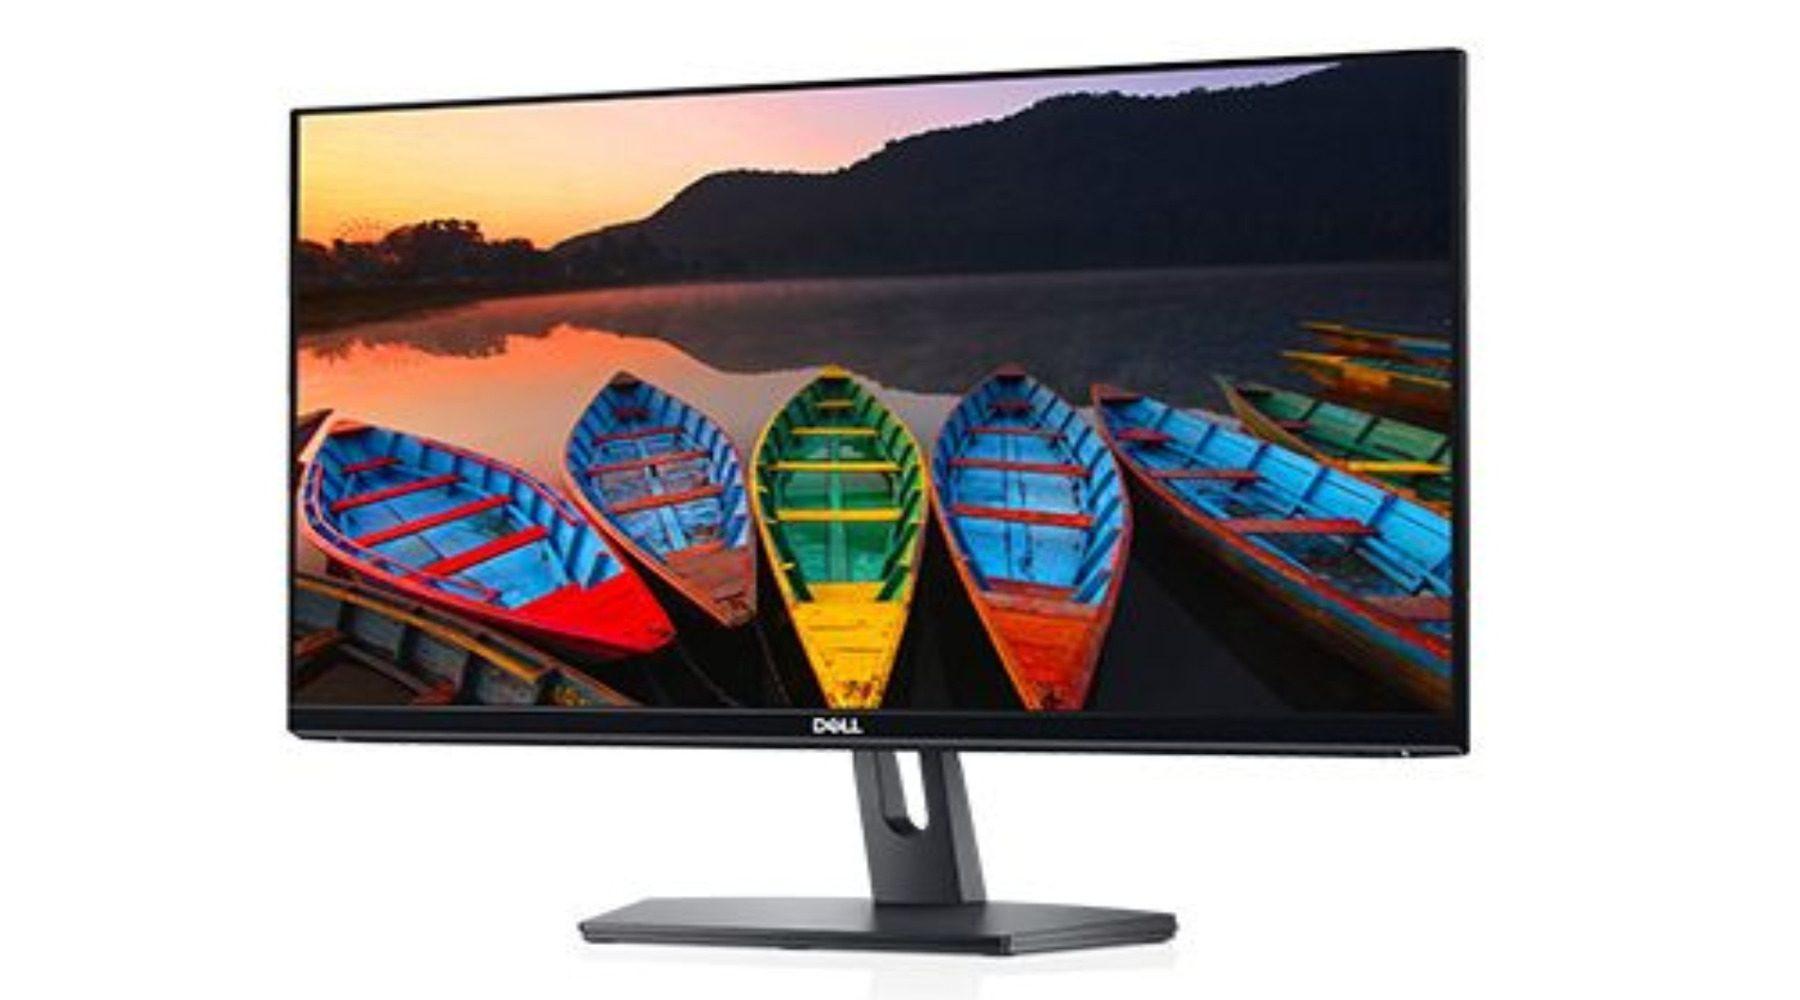 </p><h4>Dell Monitor deals</h4><p>